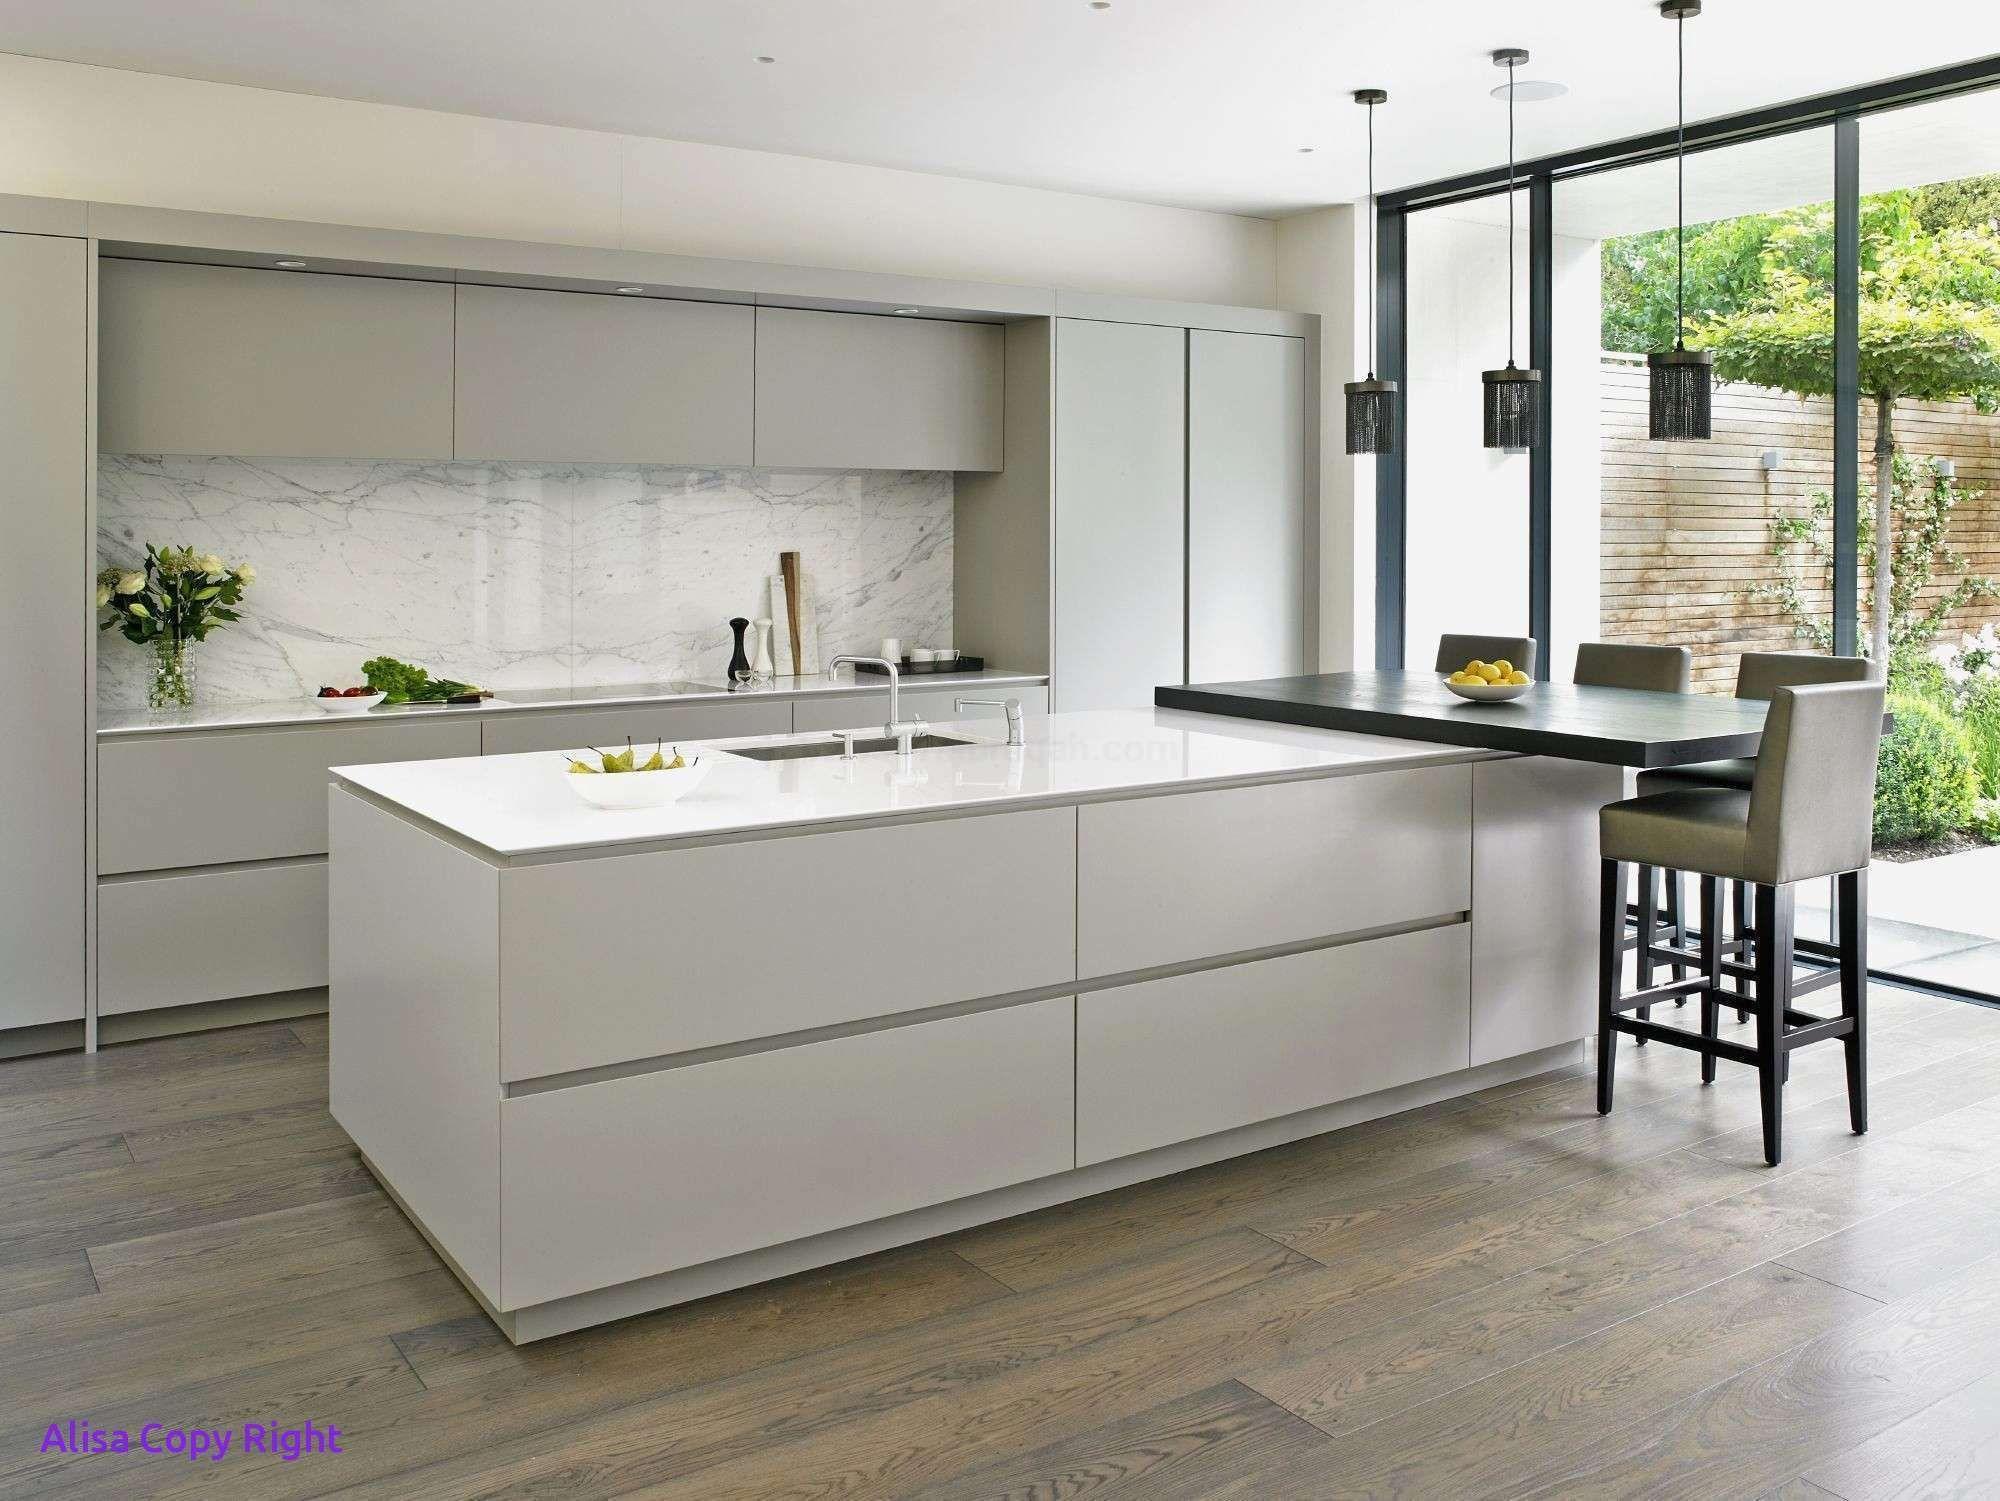 Small Kitchen island Ideas homedecoration homedecorations ...